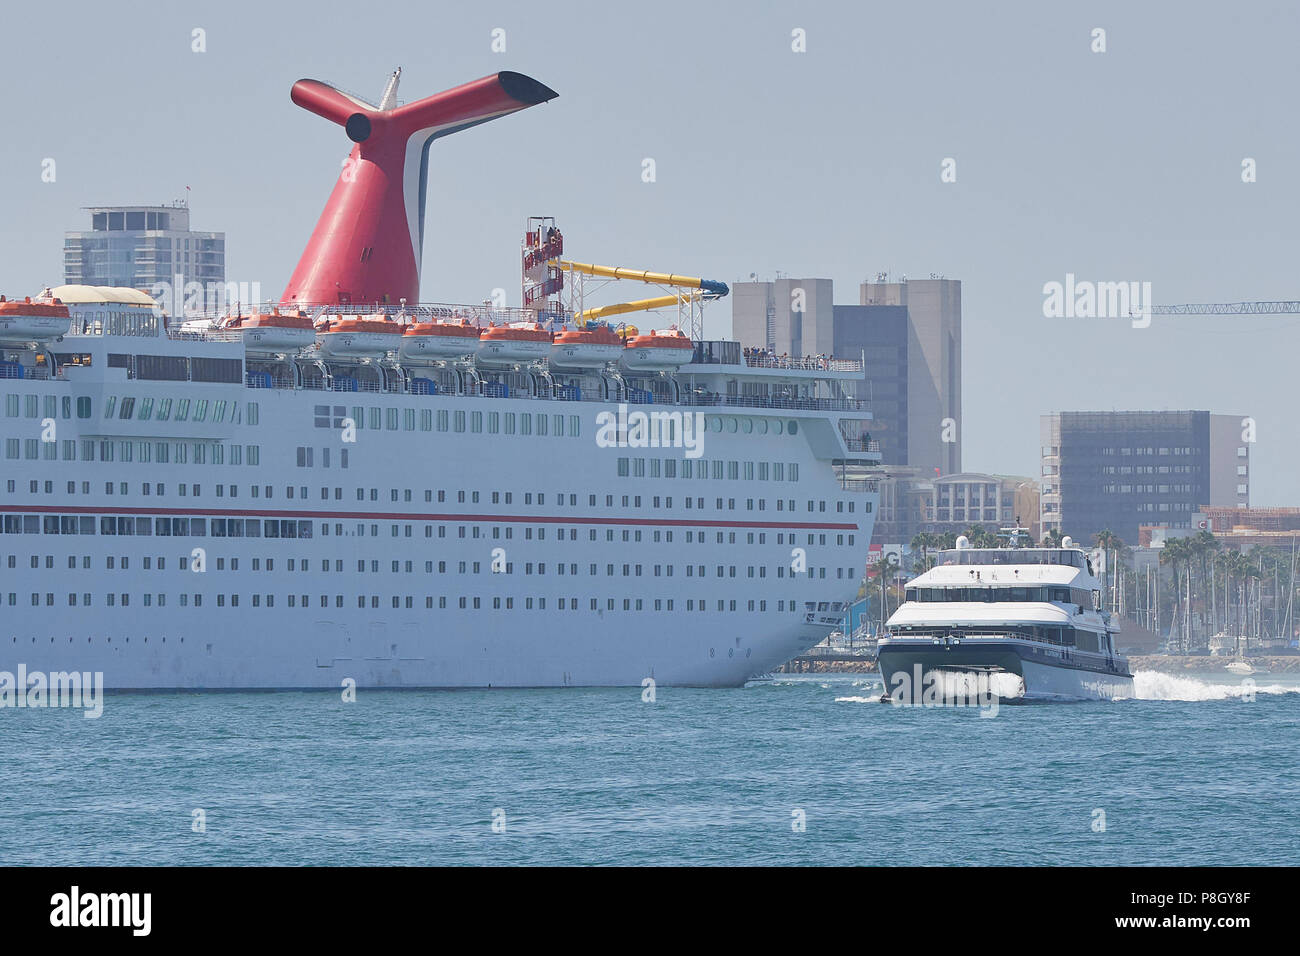 catalina express seacat catalina jet passes the carnival